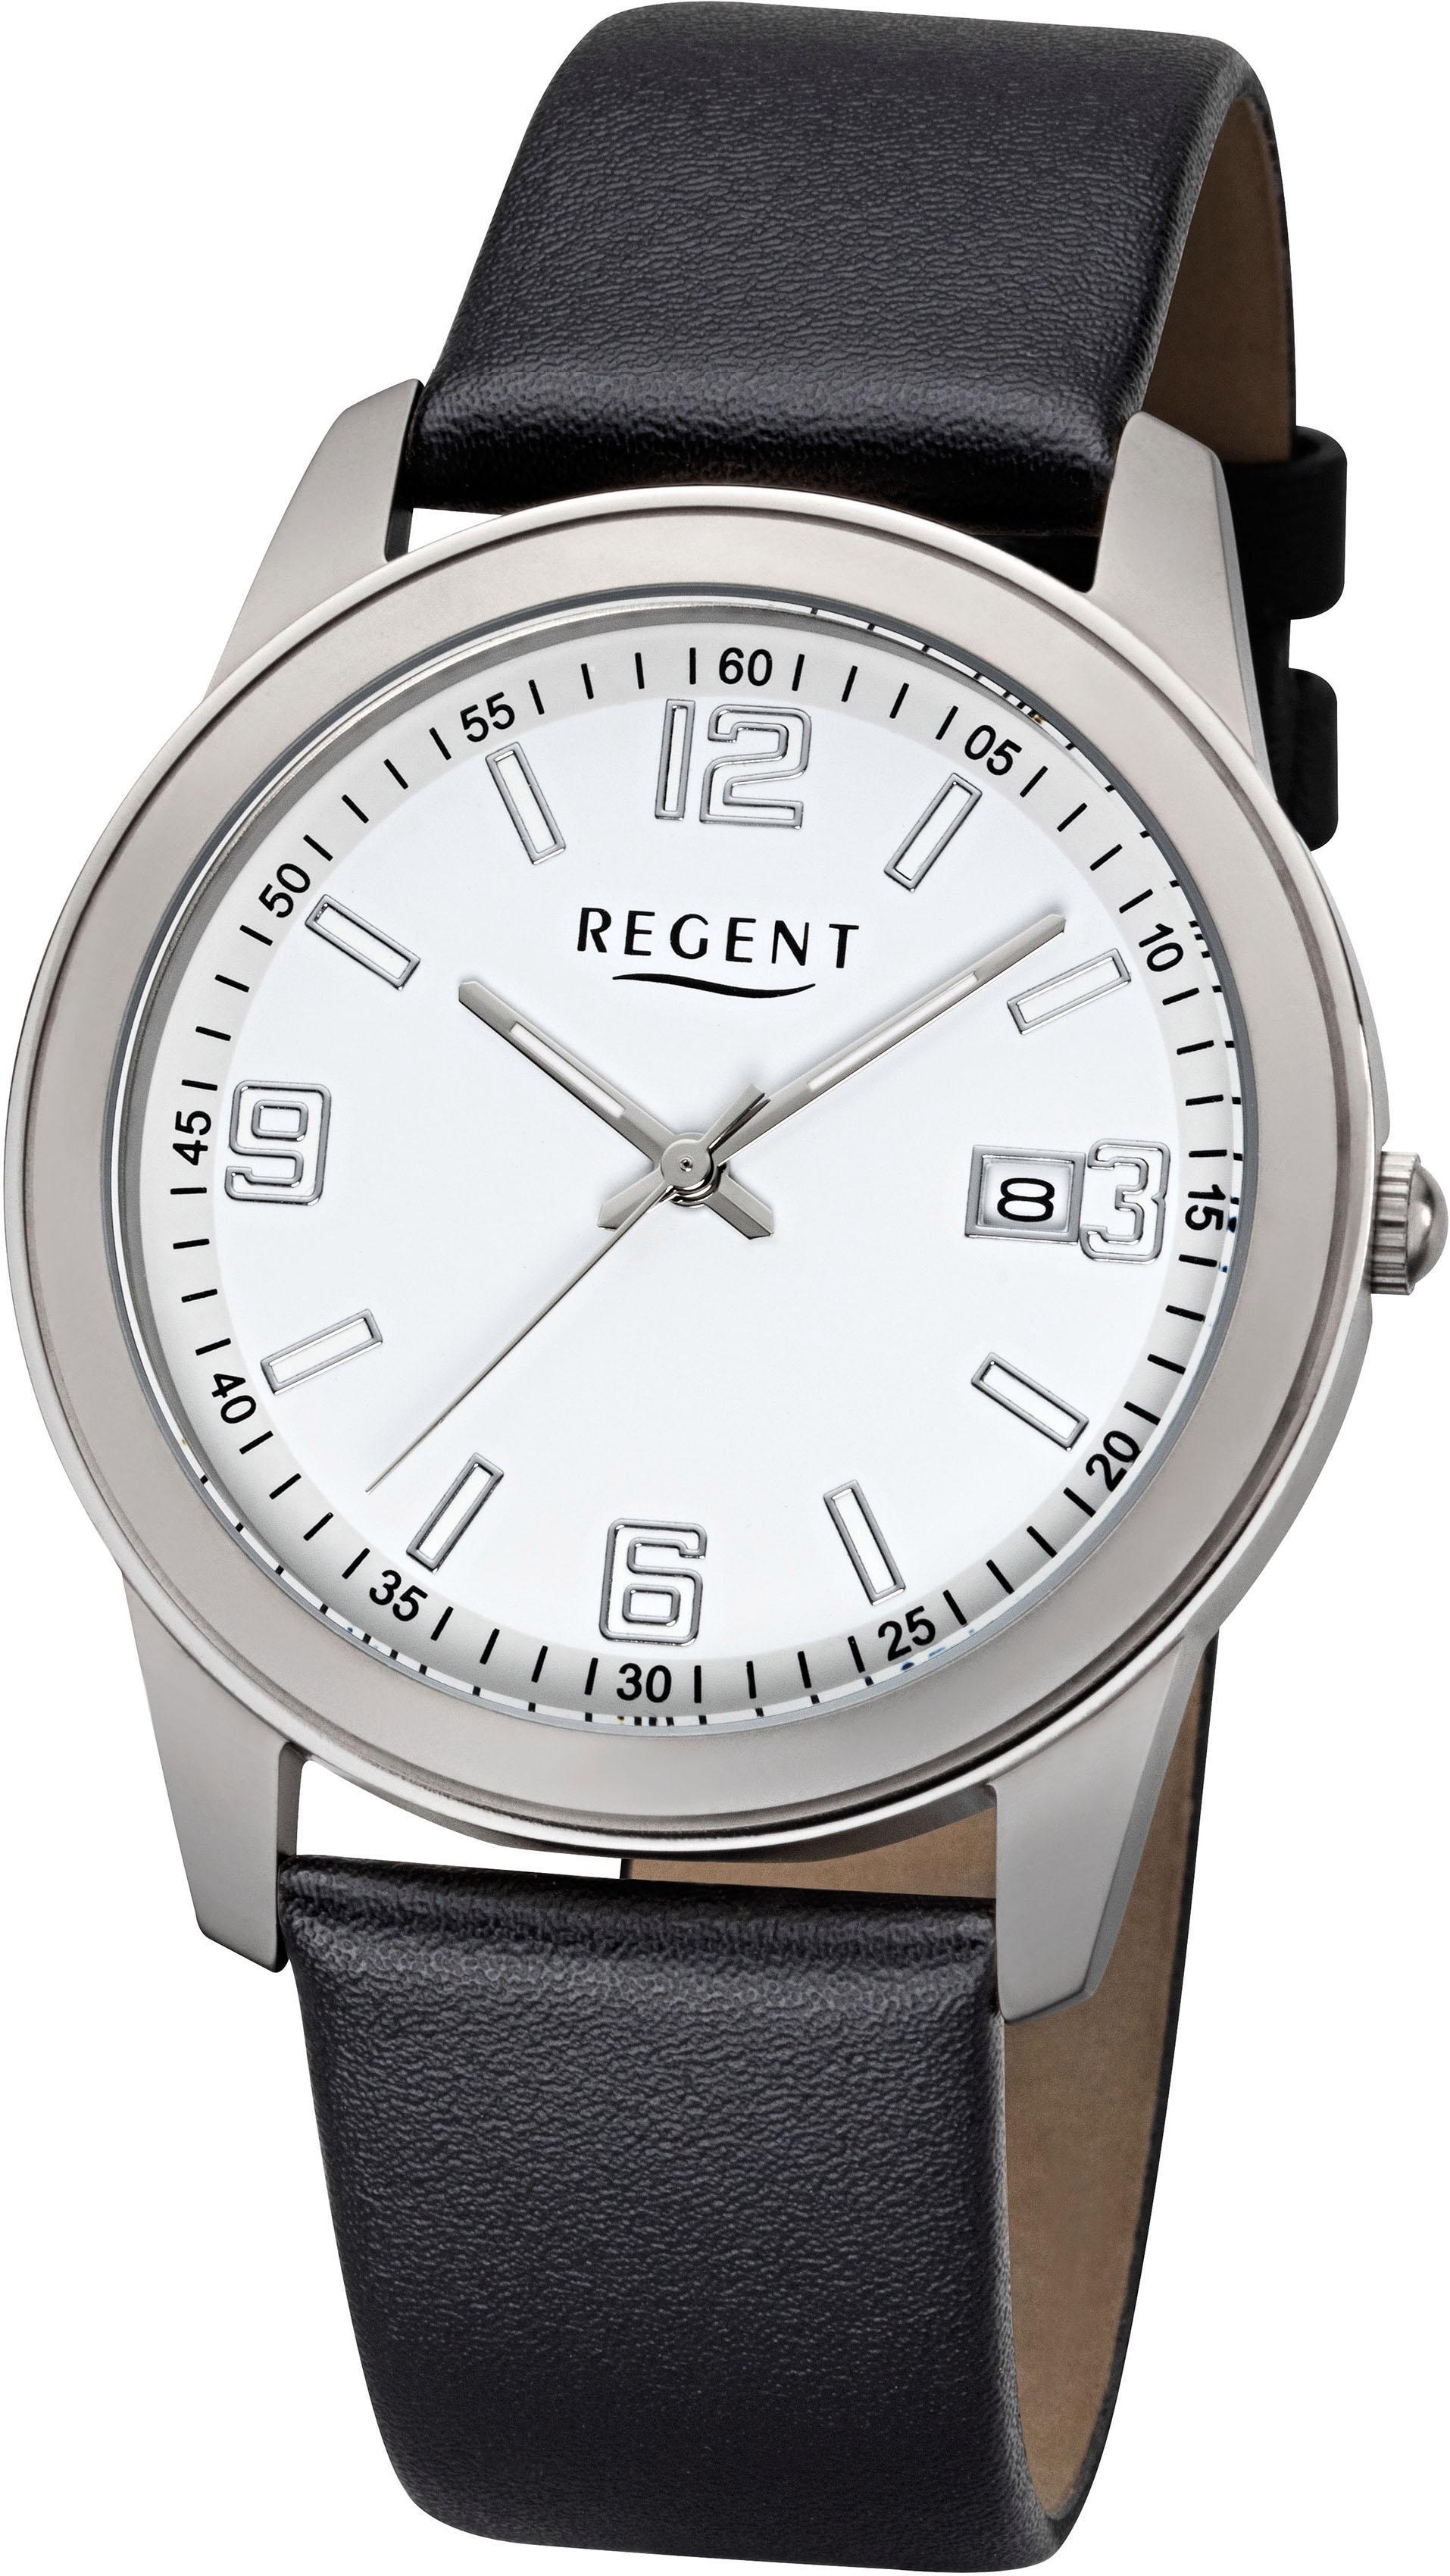 Regent Quarzuhr 11409020 | Uhren > Quarzuhren | Schwarz | Regent